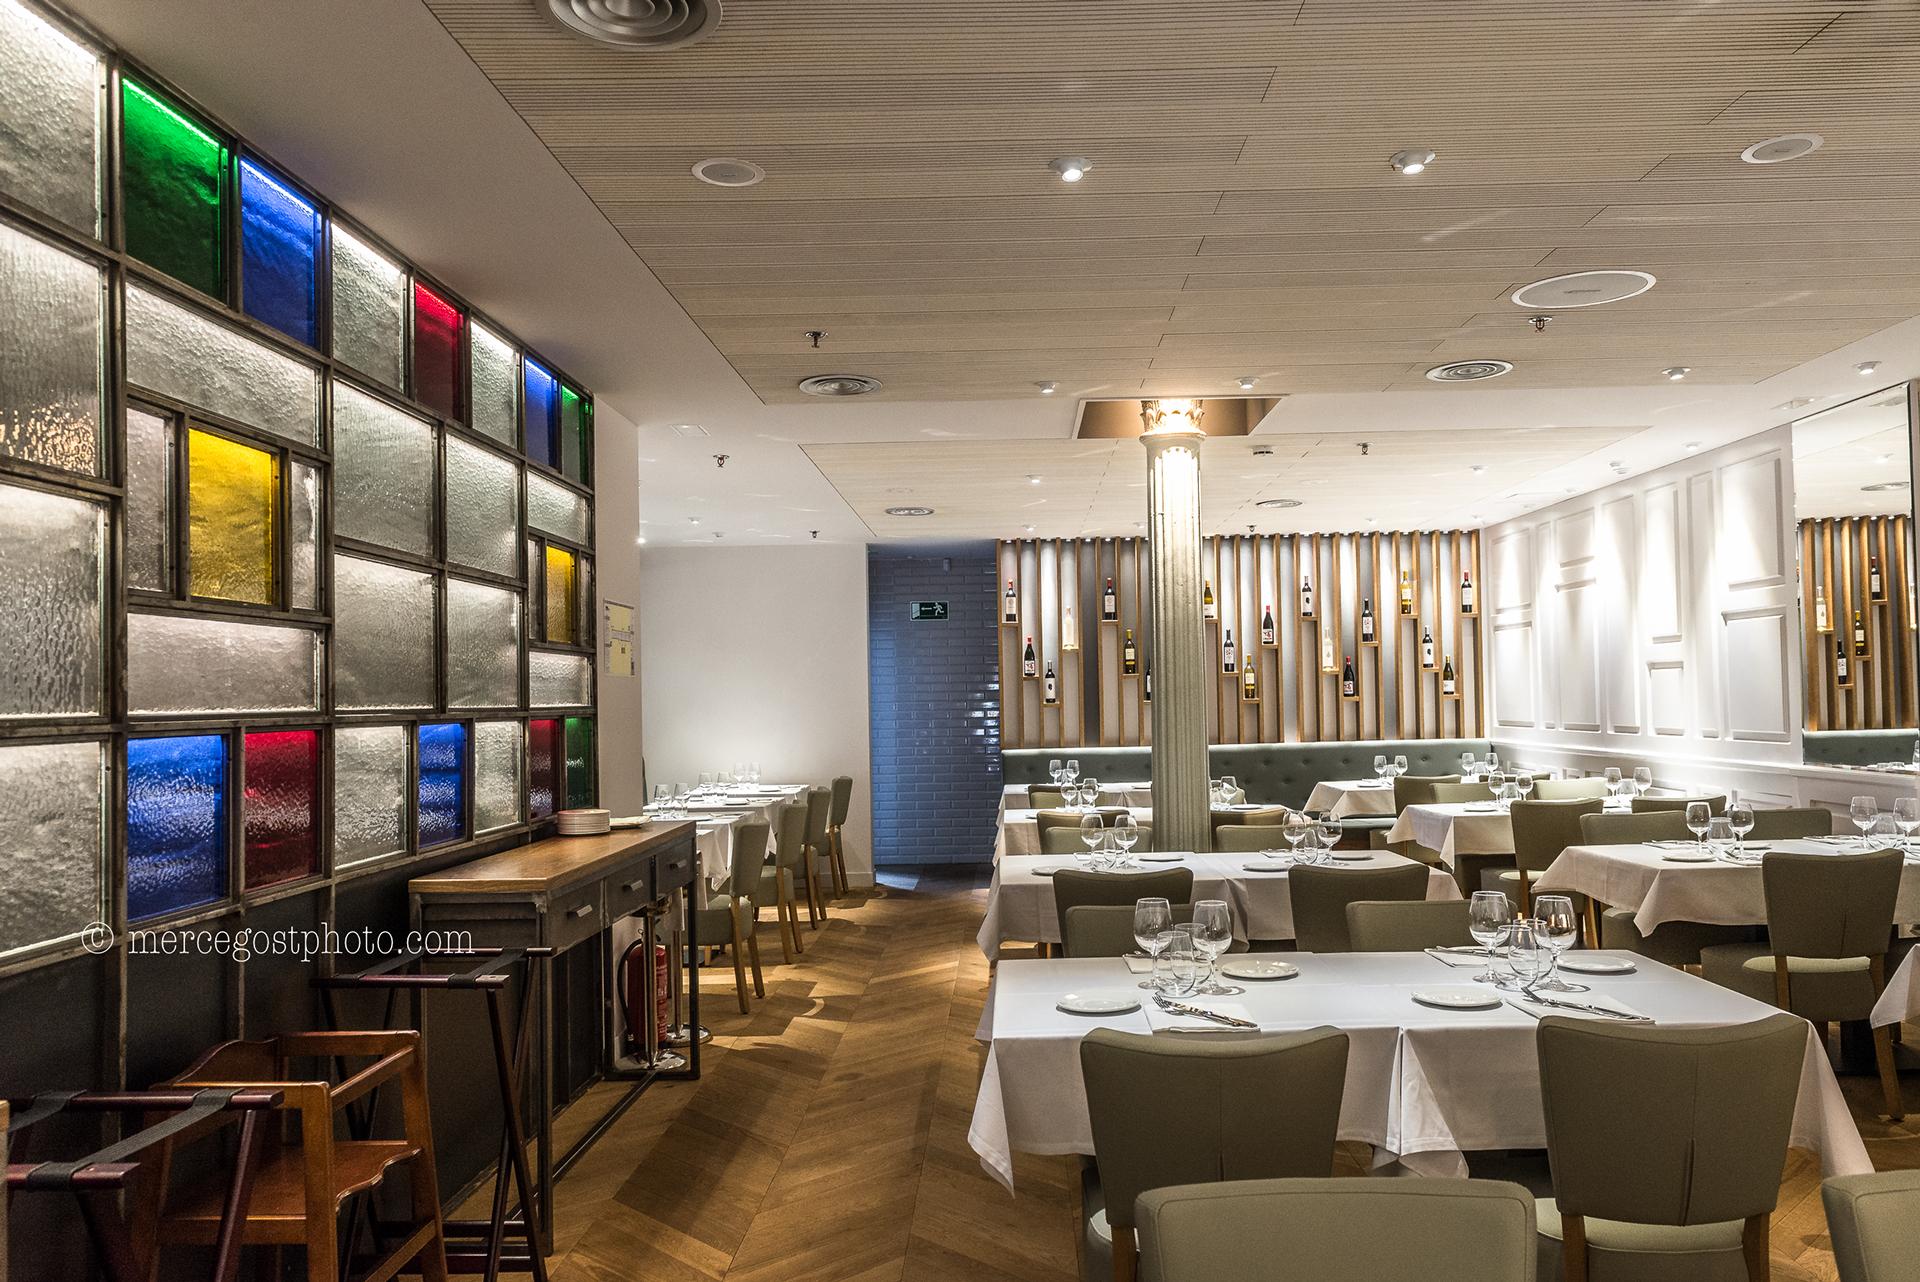 The Cullera de Boix Restaurant in Barcelona, Spain by Batua Interiores Creativos